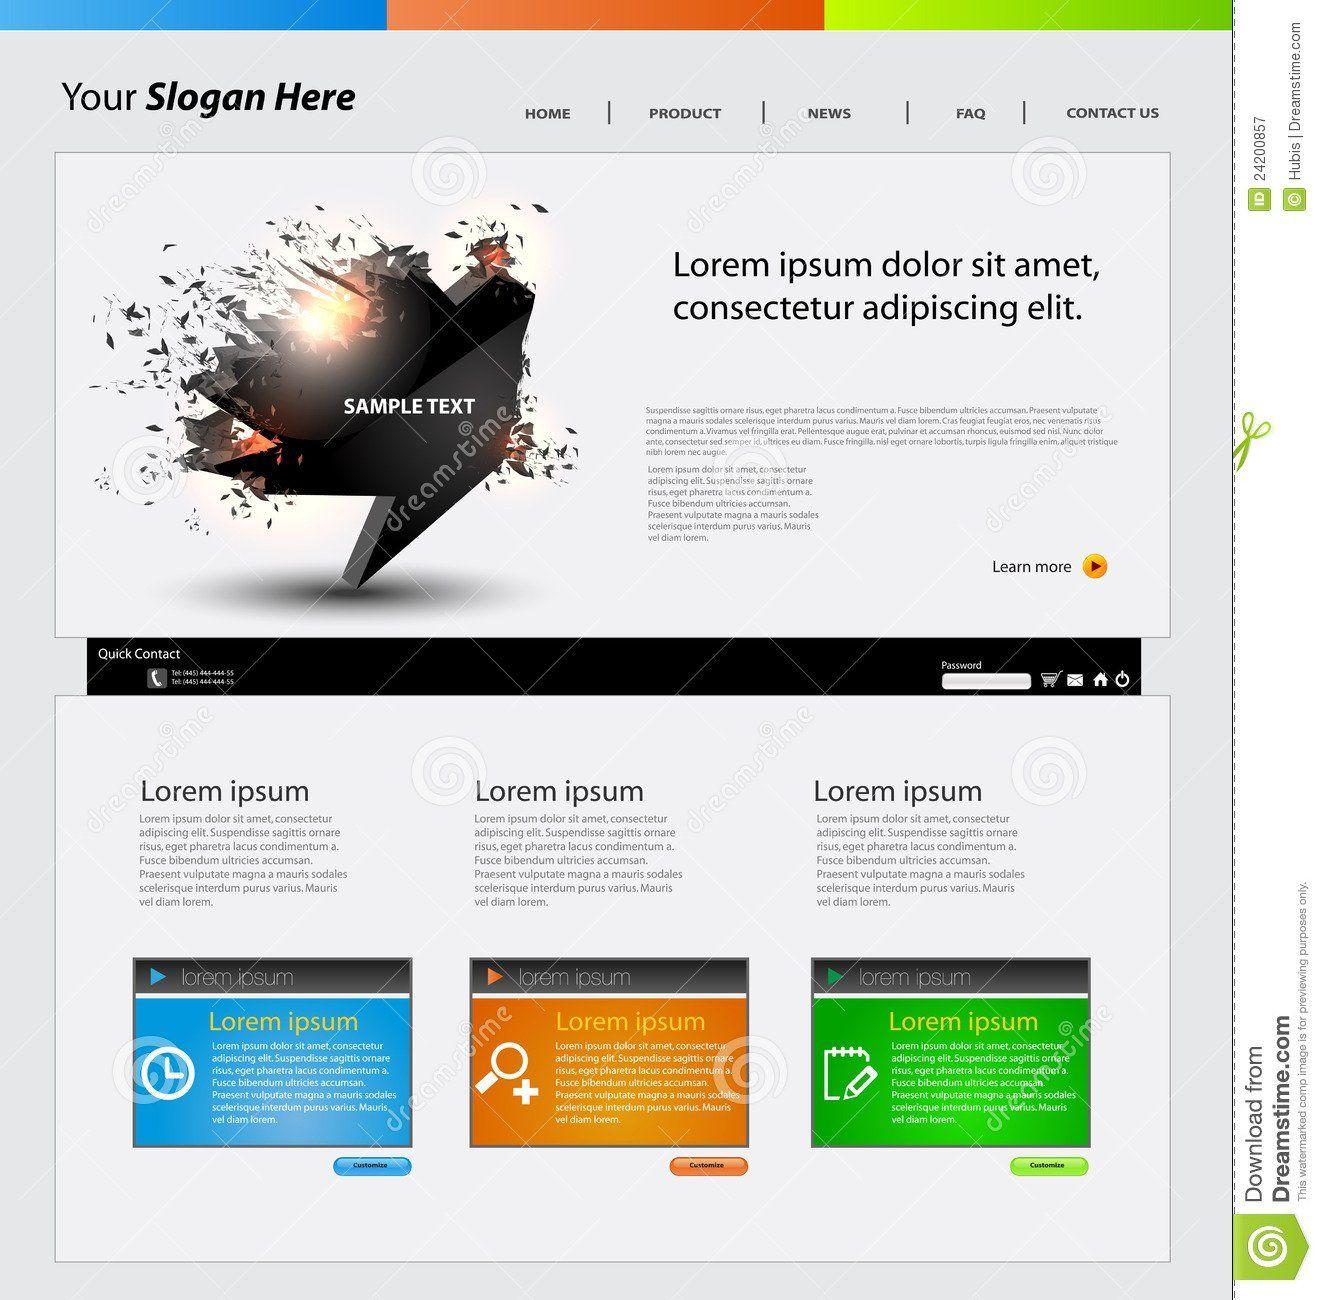 Top 20 Web Design Singapore Companies In 2020 Web Design Ecommerce Website Design Web Template Design